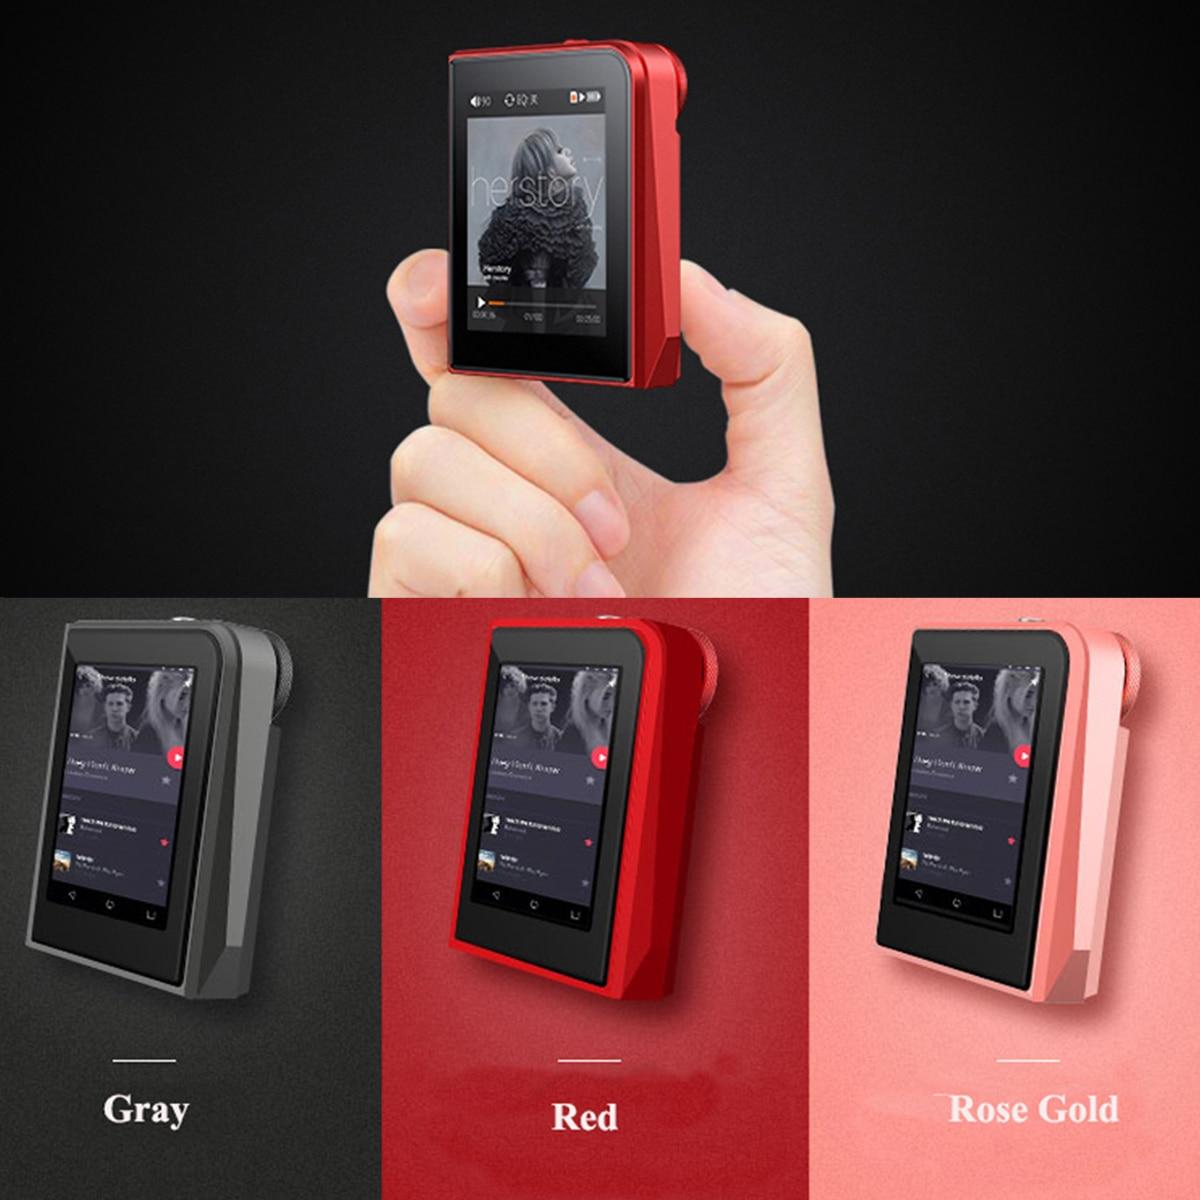 Mp3 lecteur RUIZU A50 MP3 clé lecteur de musique walkman écran TFT 8 GB Soutien 28 langue Android MP3 WMA JPG BMP WAV